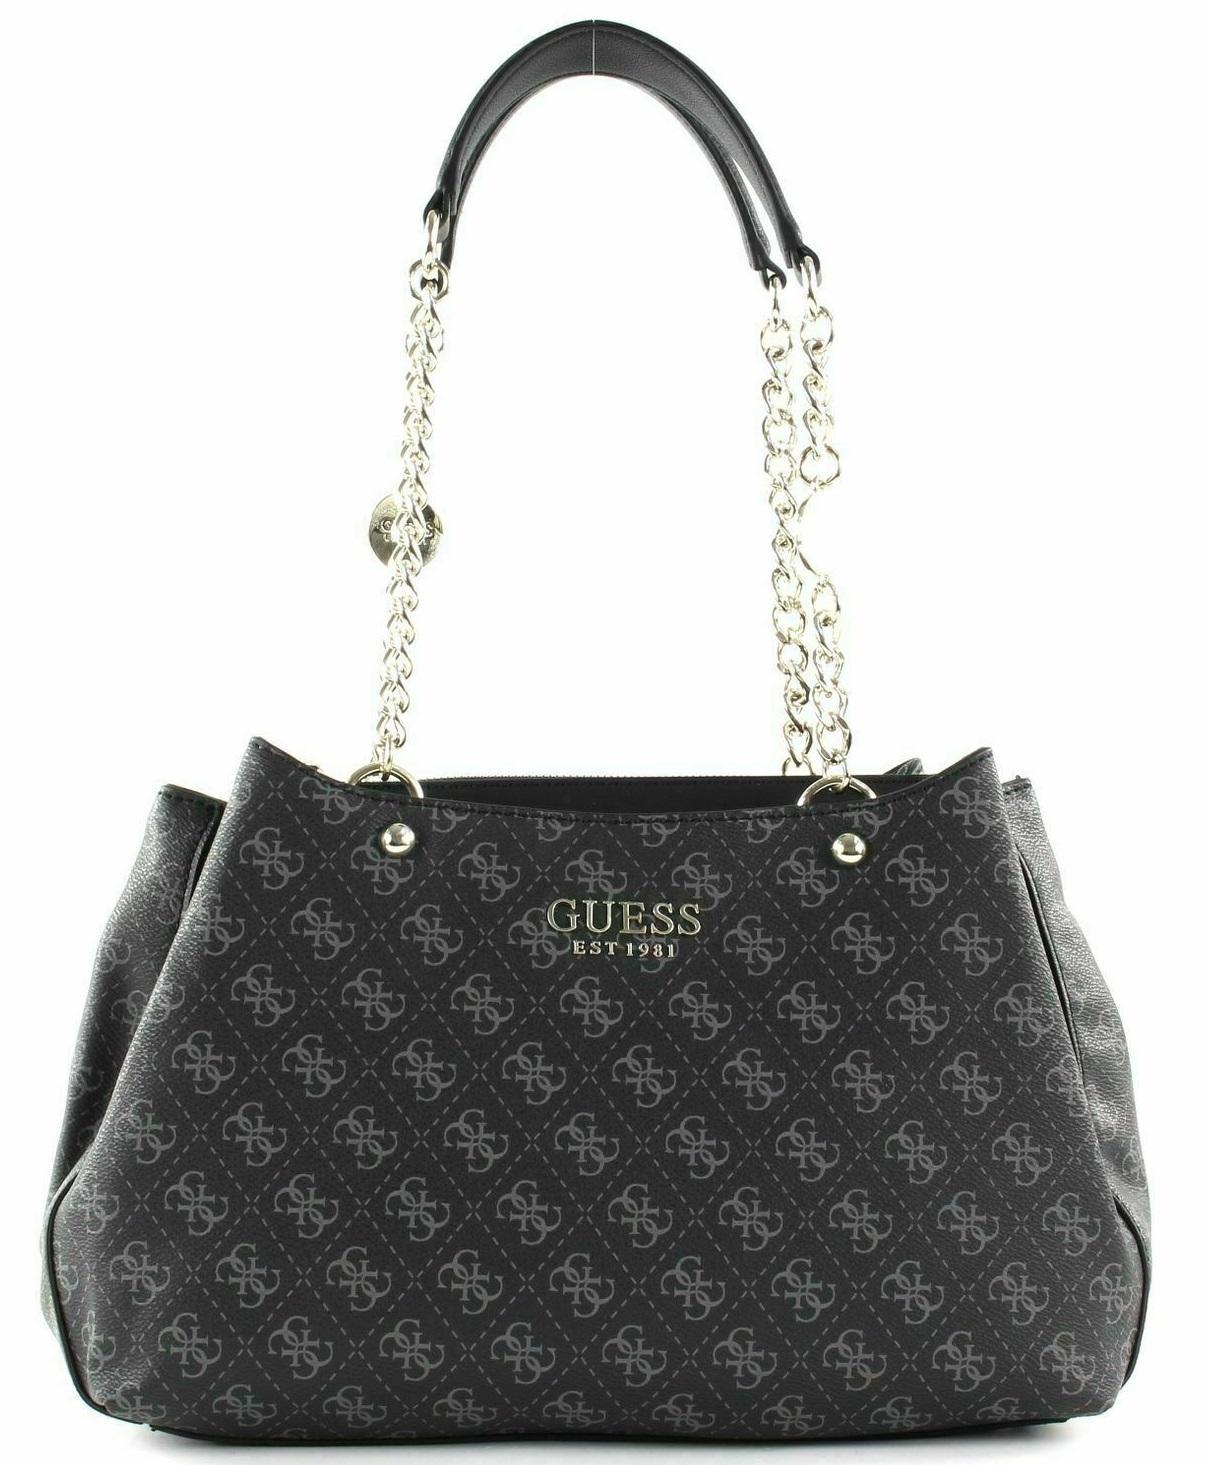 Guess Lorenna Girlfriend Shopper Bag